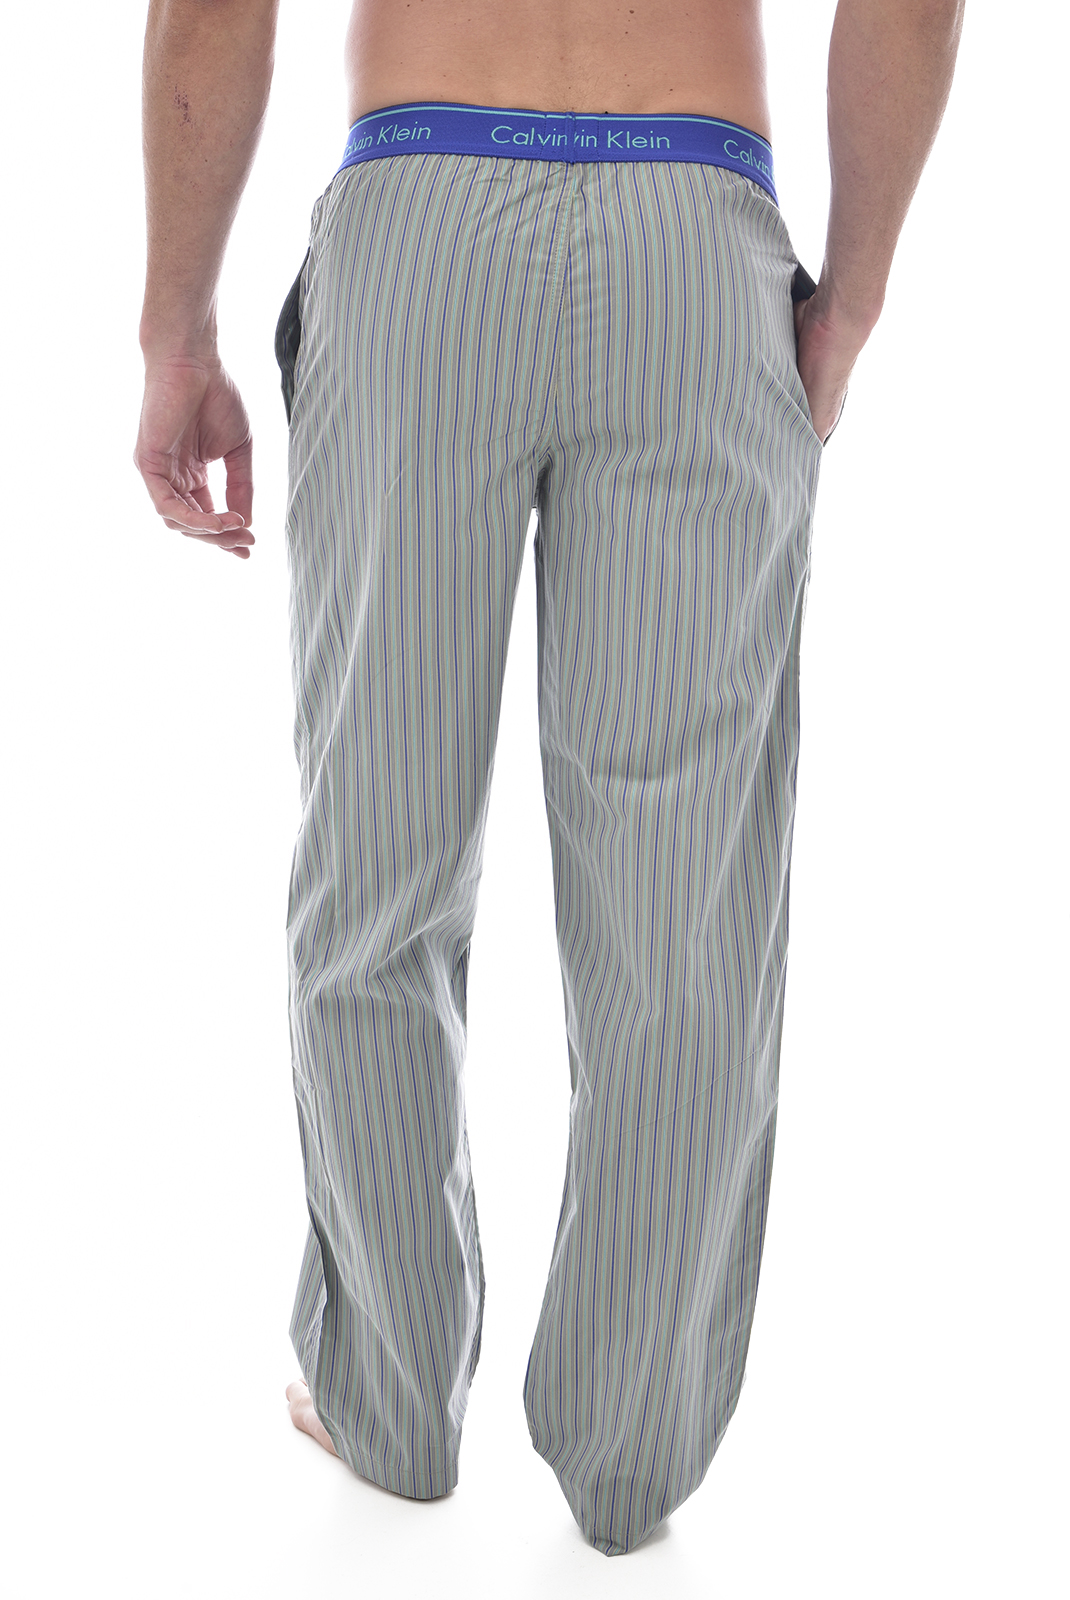 Pyjamas-Peignoirs  Calvin klein 0000U1723A 3DU